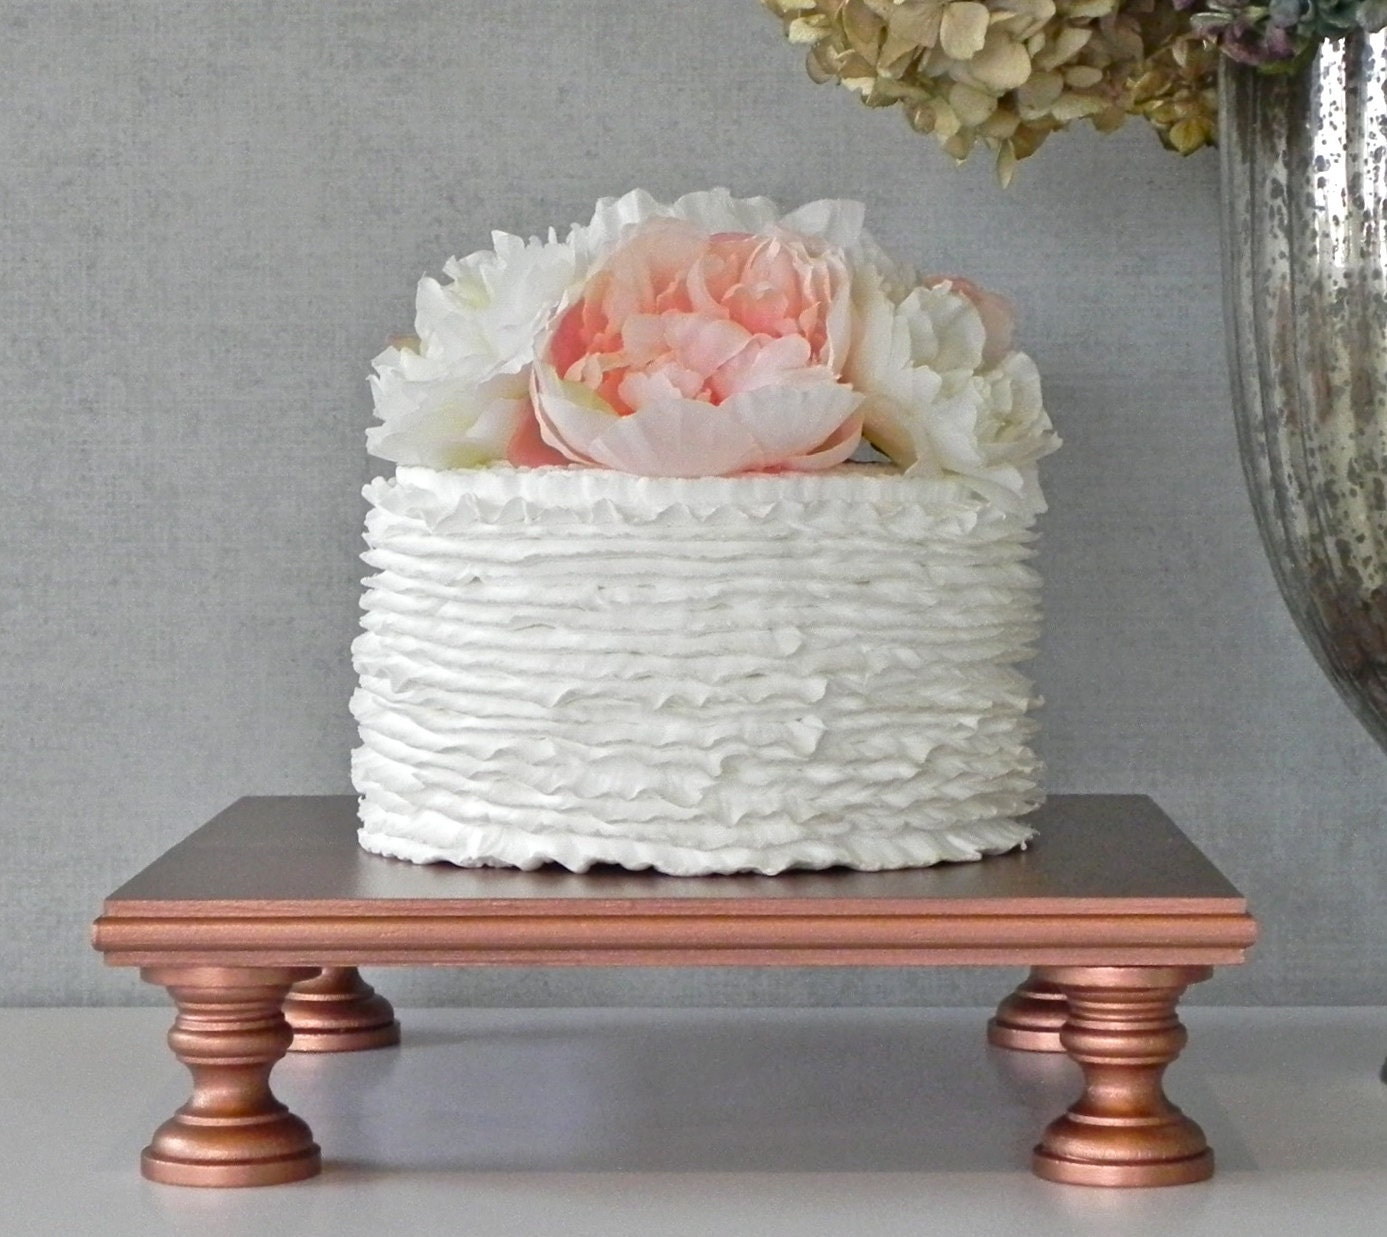 Rose Gold Cake Stand 14 Cupcake Square Vintage Gold Cake